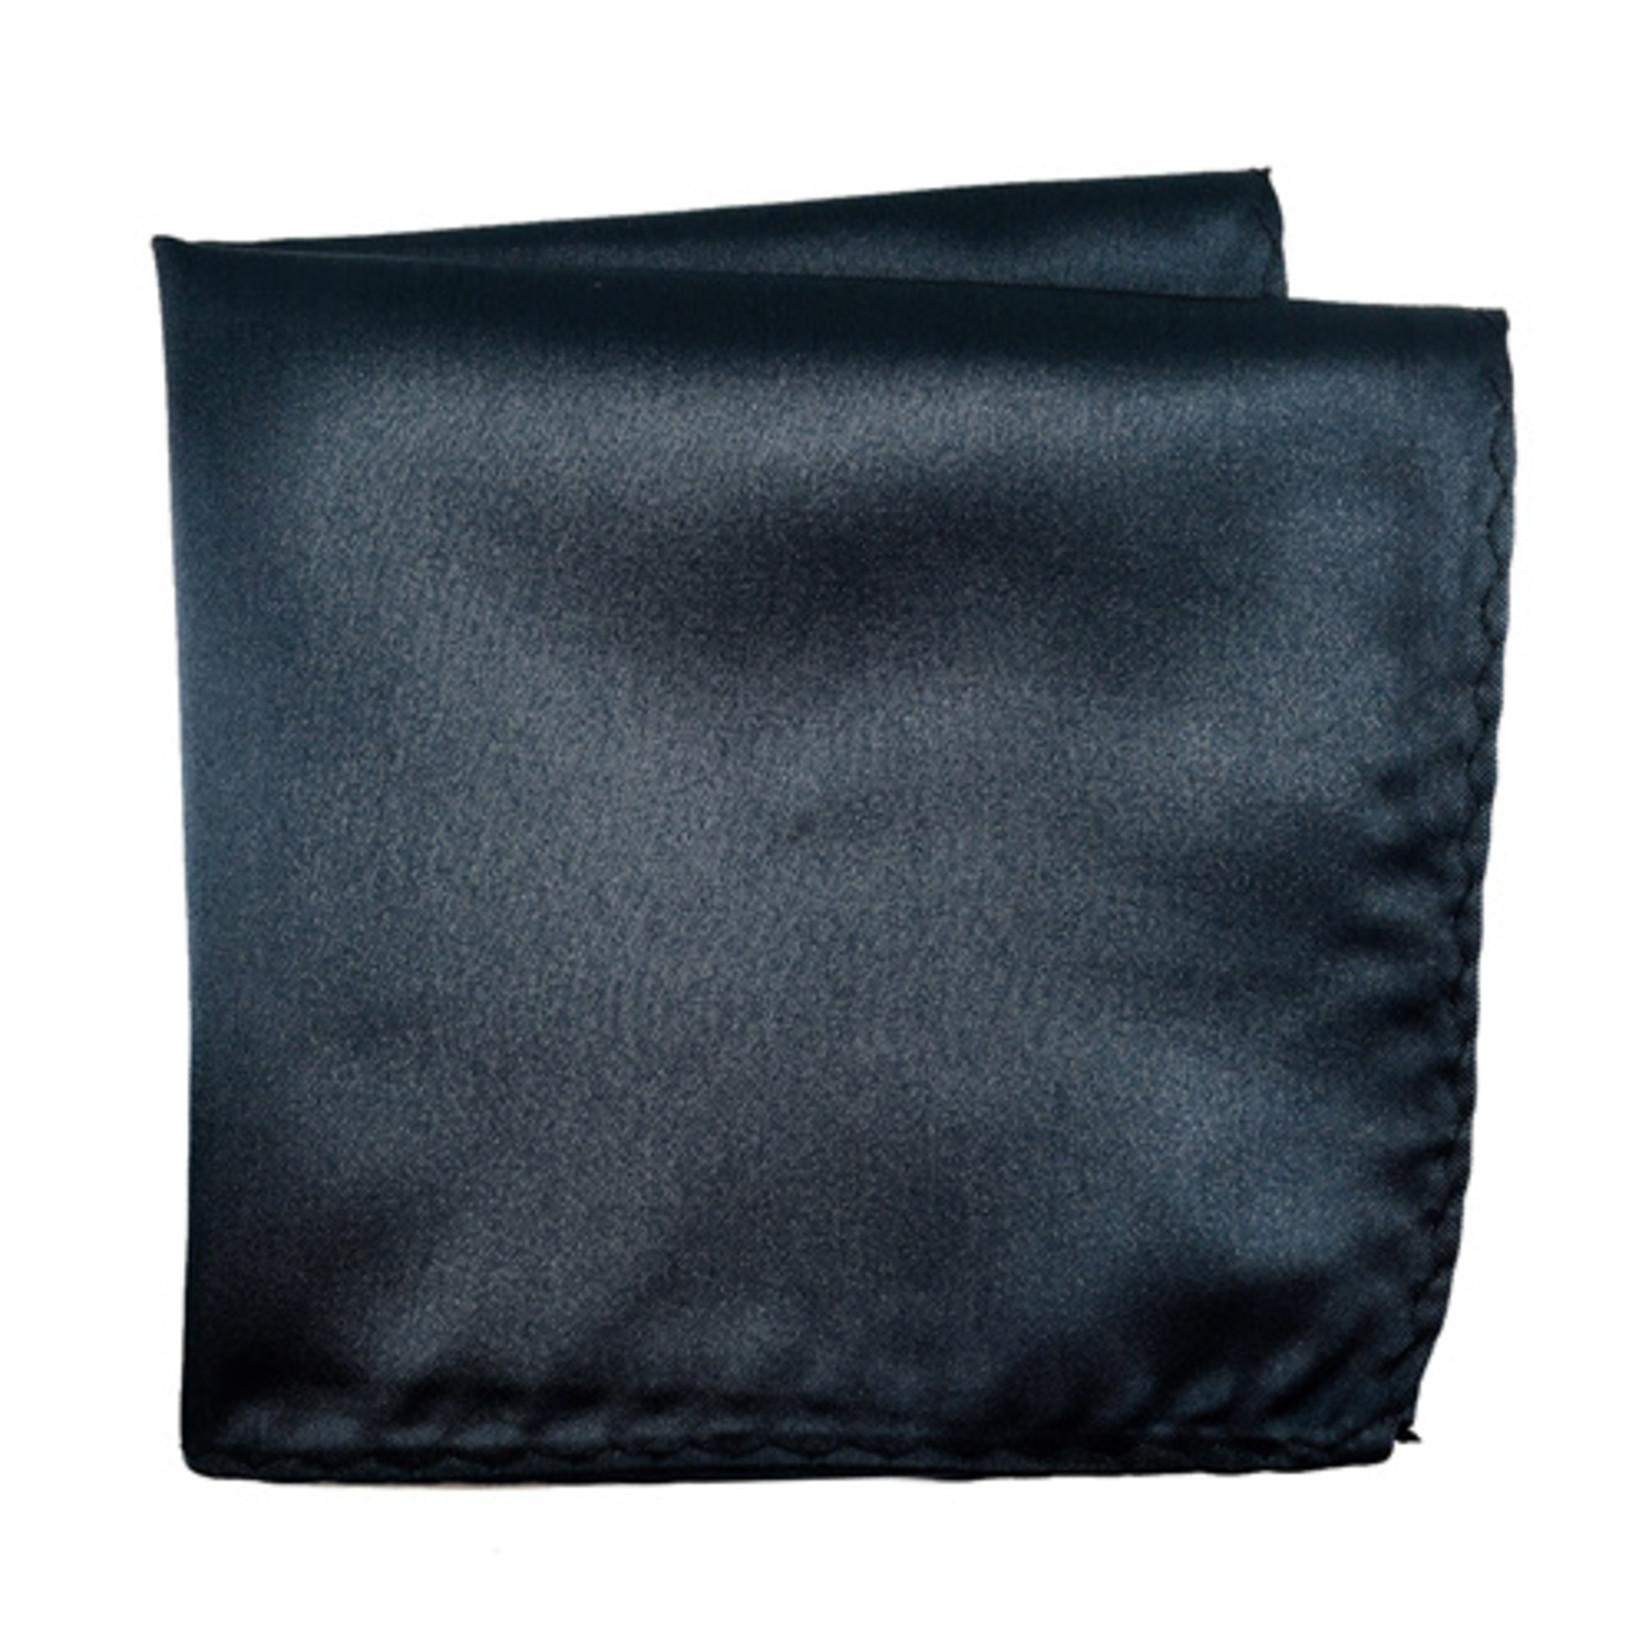 Knotz M100PSQ-29 Solid Charcoal Pocket Square